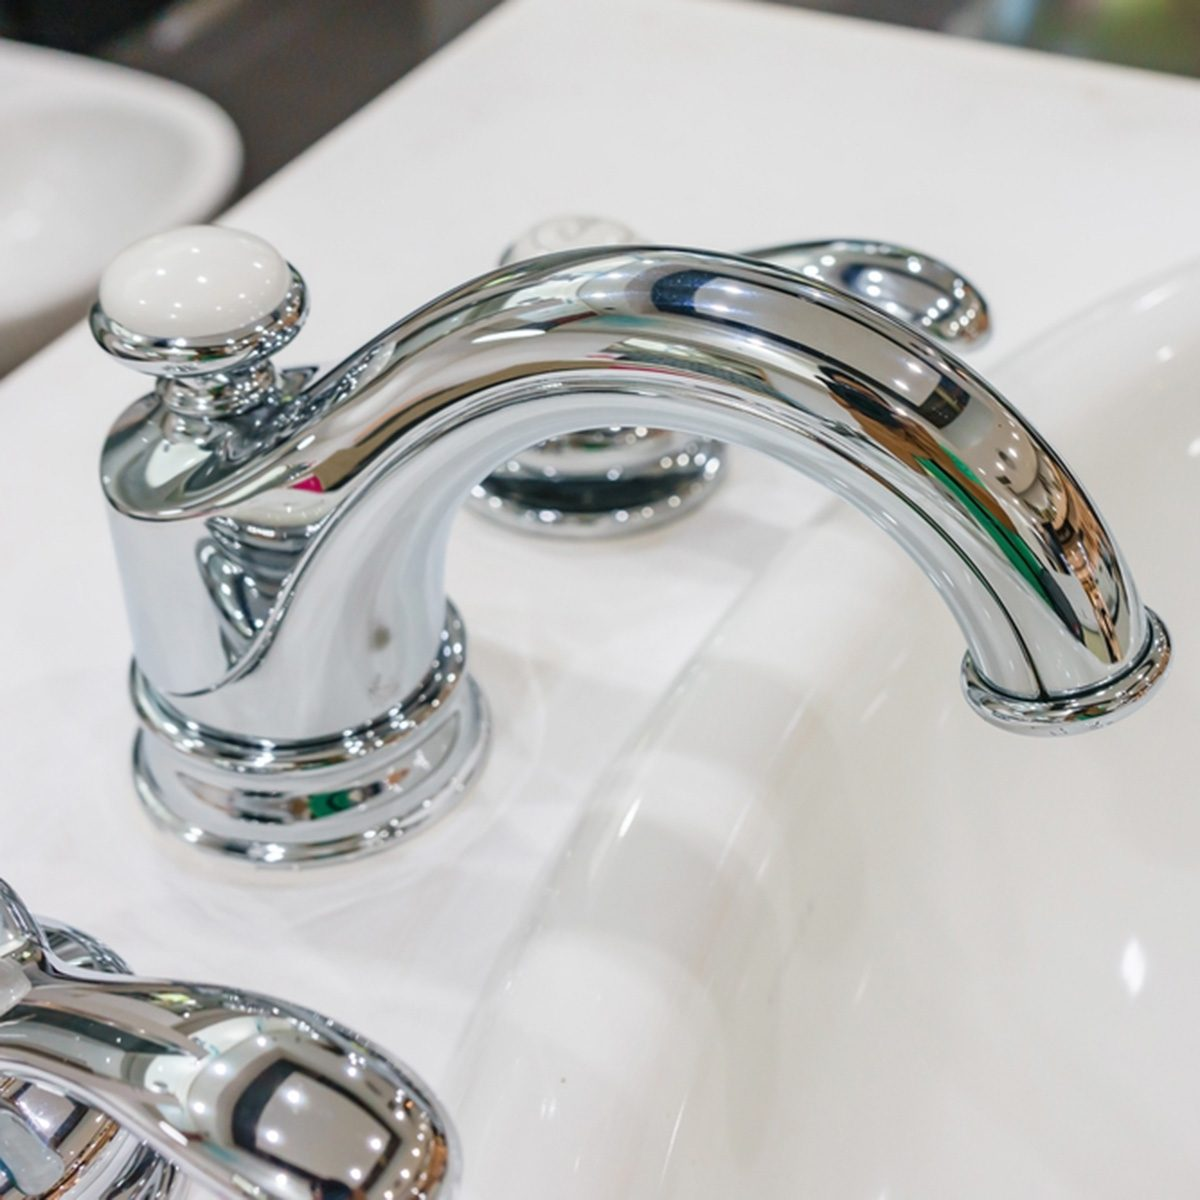 Chrome bathroom faucet. Bathroom water tap. Modern faucet. Bathroom interior. Modern design. Luxury faucet. Modern water tap. Chrome faucet; Shutterstock ID 714816445; Job (TFH, TOH, RD, BNB, CWM, CM): Taste of Home